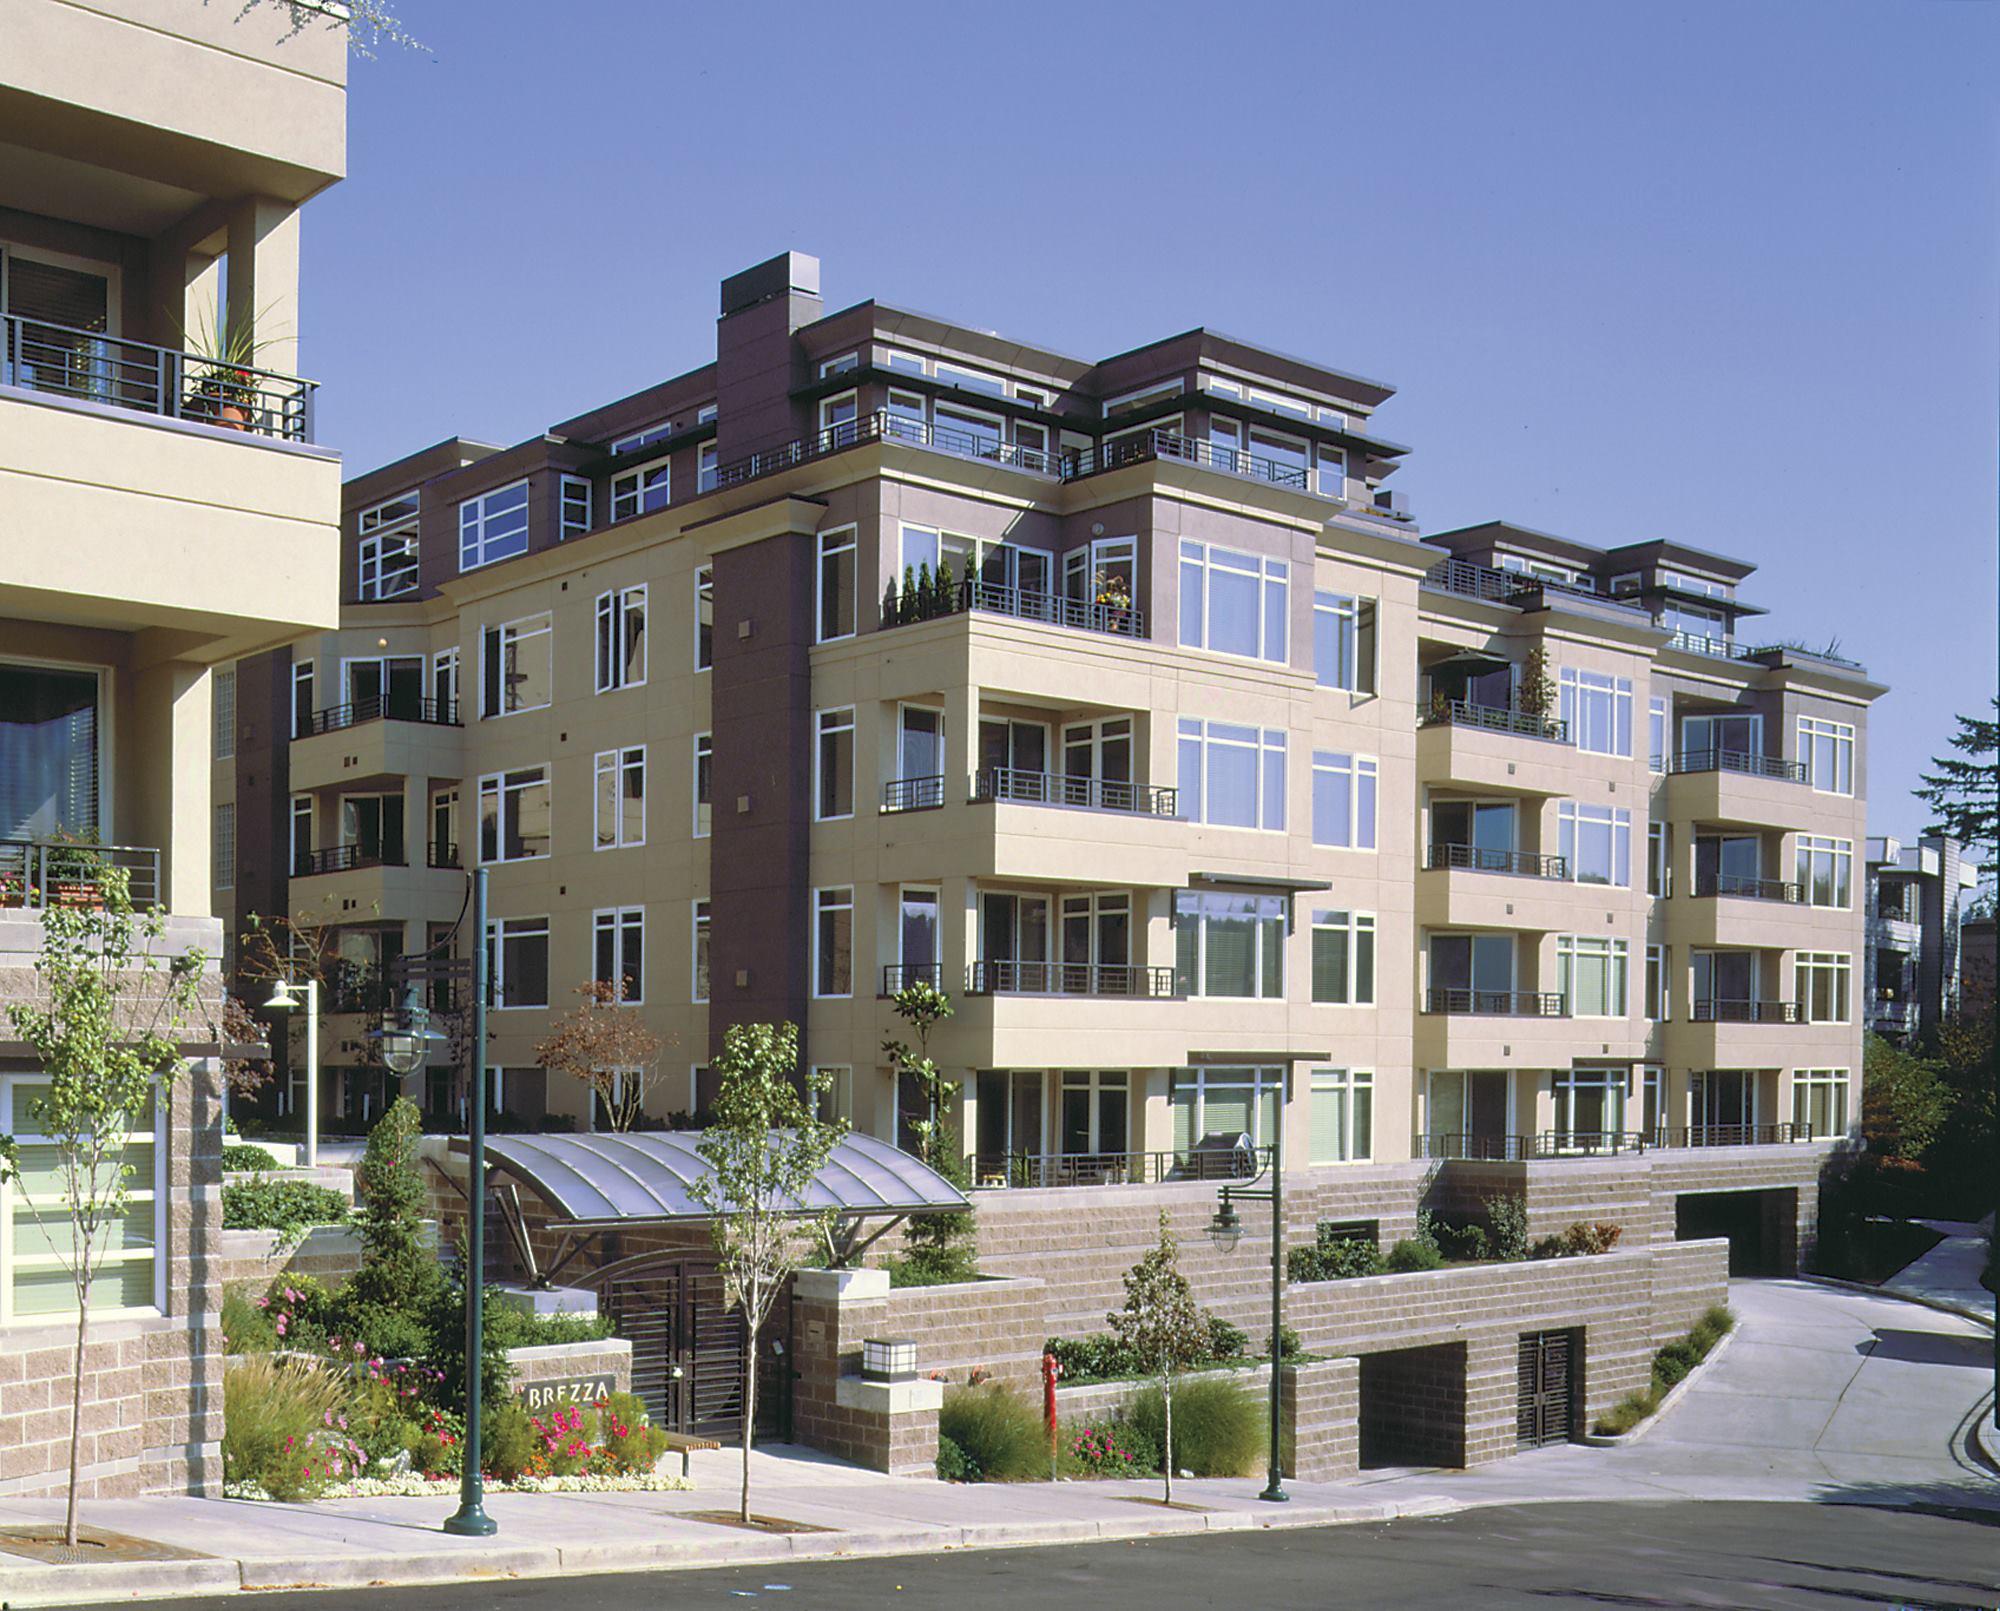 Brezza condominiums kirkland wash residential for Residential architect design awards